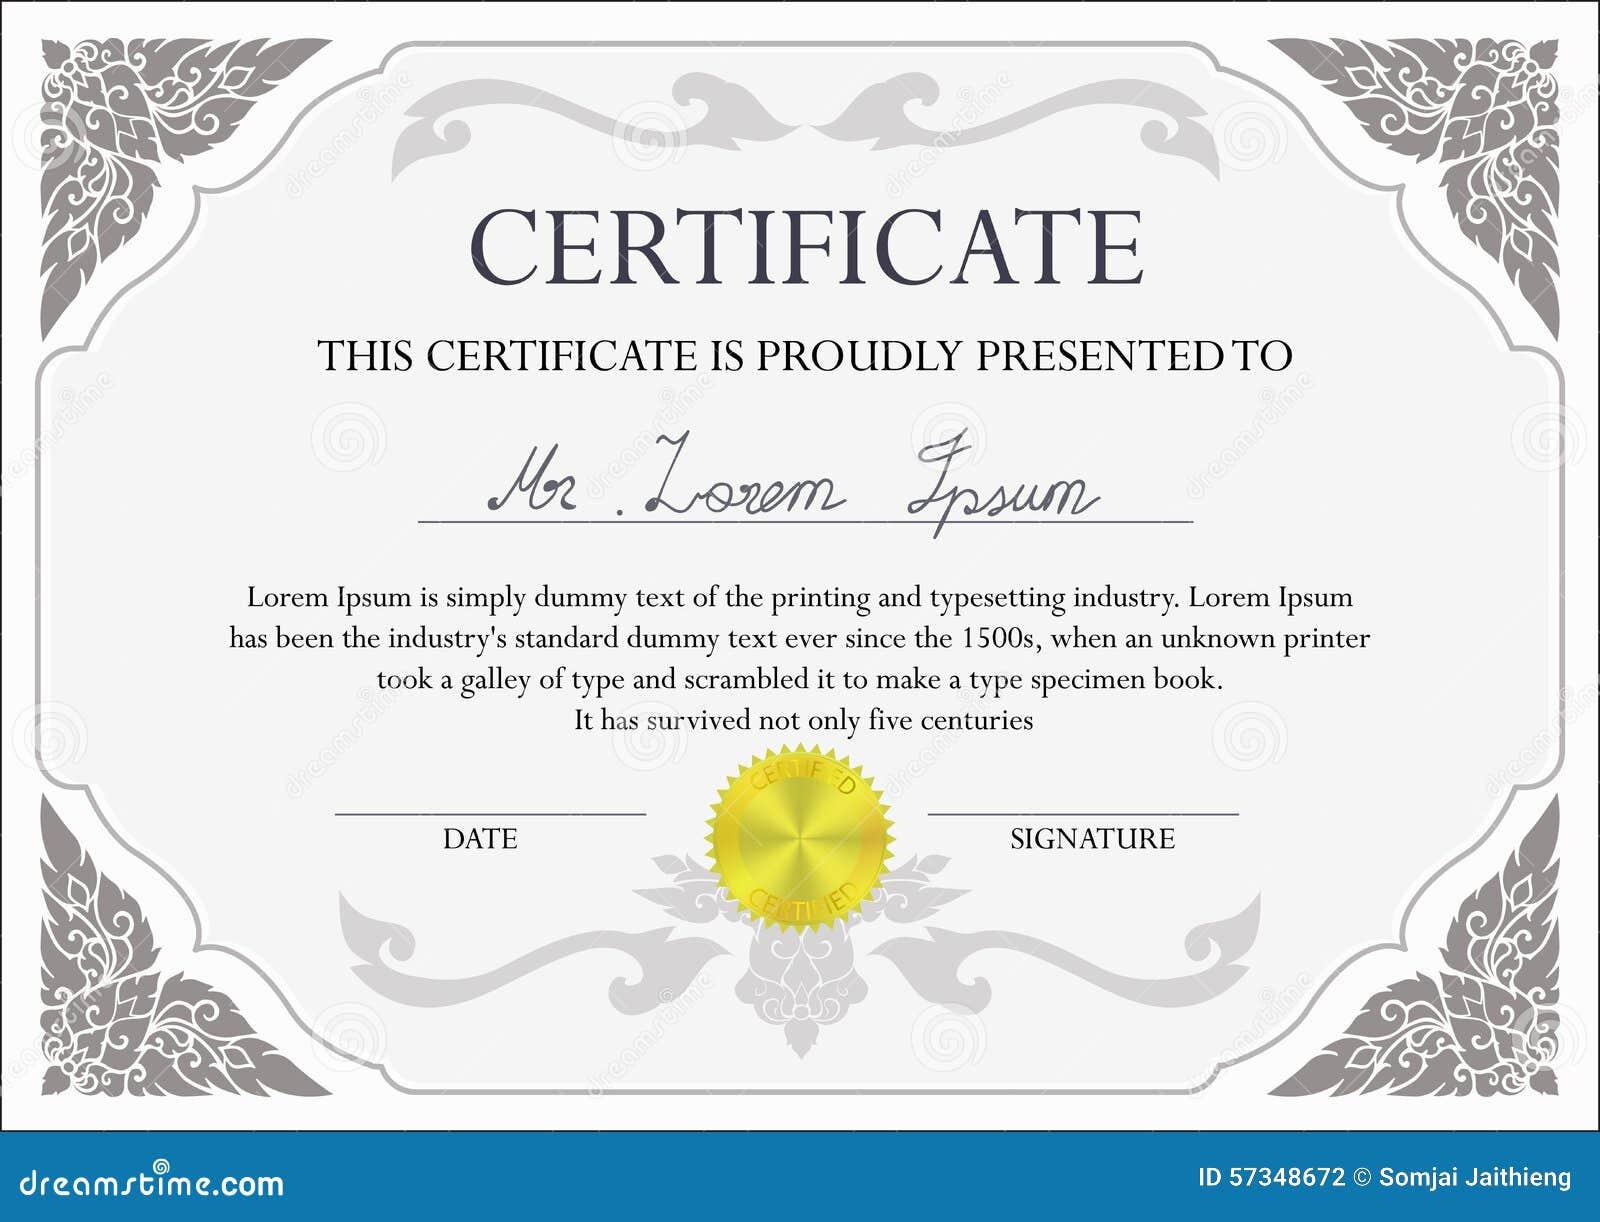 Certificate Design Template Stock Vector Illustration Of Ornate